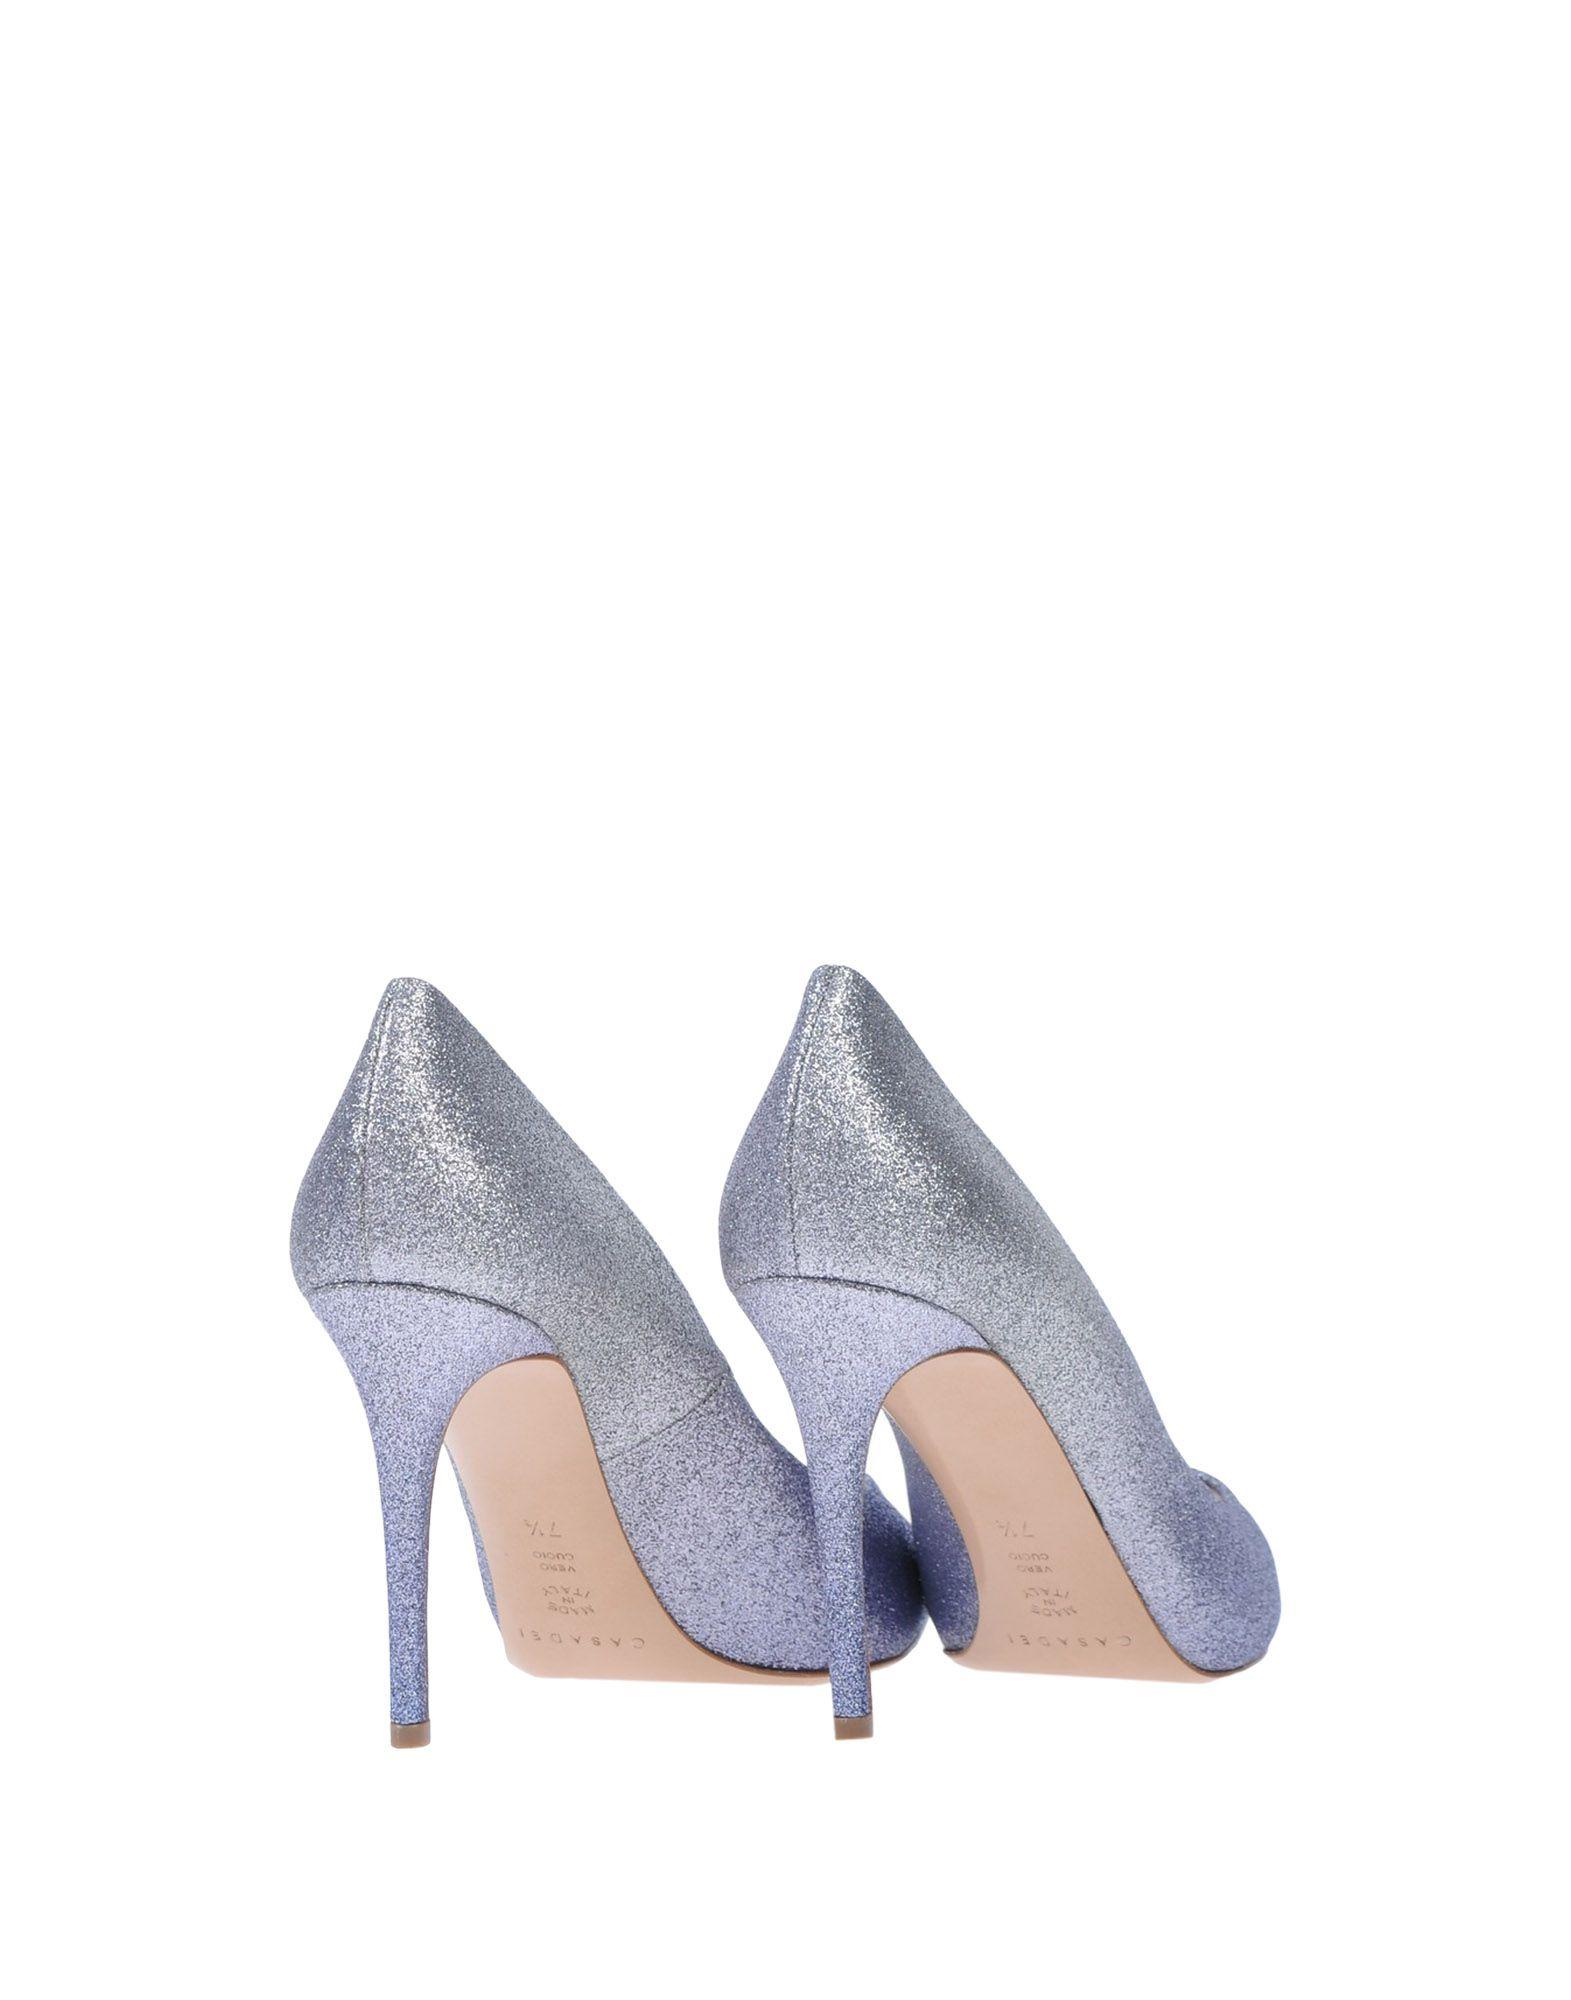 Haltbare Mode billige Schuhe Casadei 11126426JV Pumps Damen  11126426JV Casadei Heiße Schuhe fe9c7d